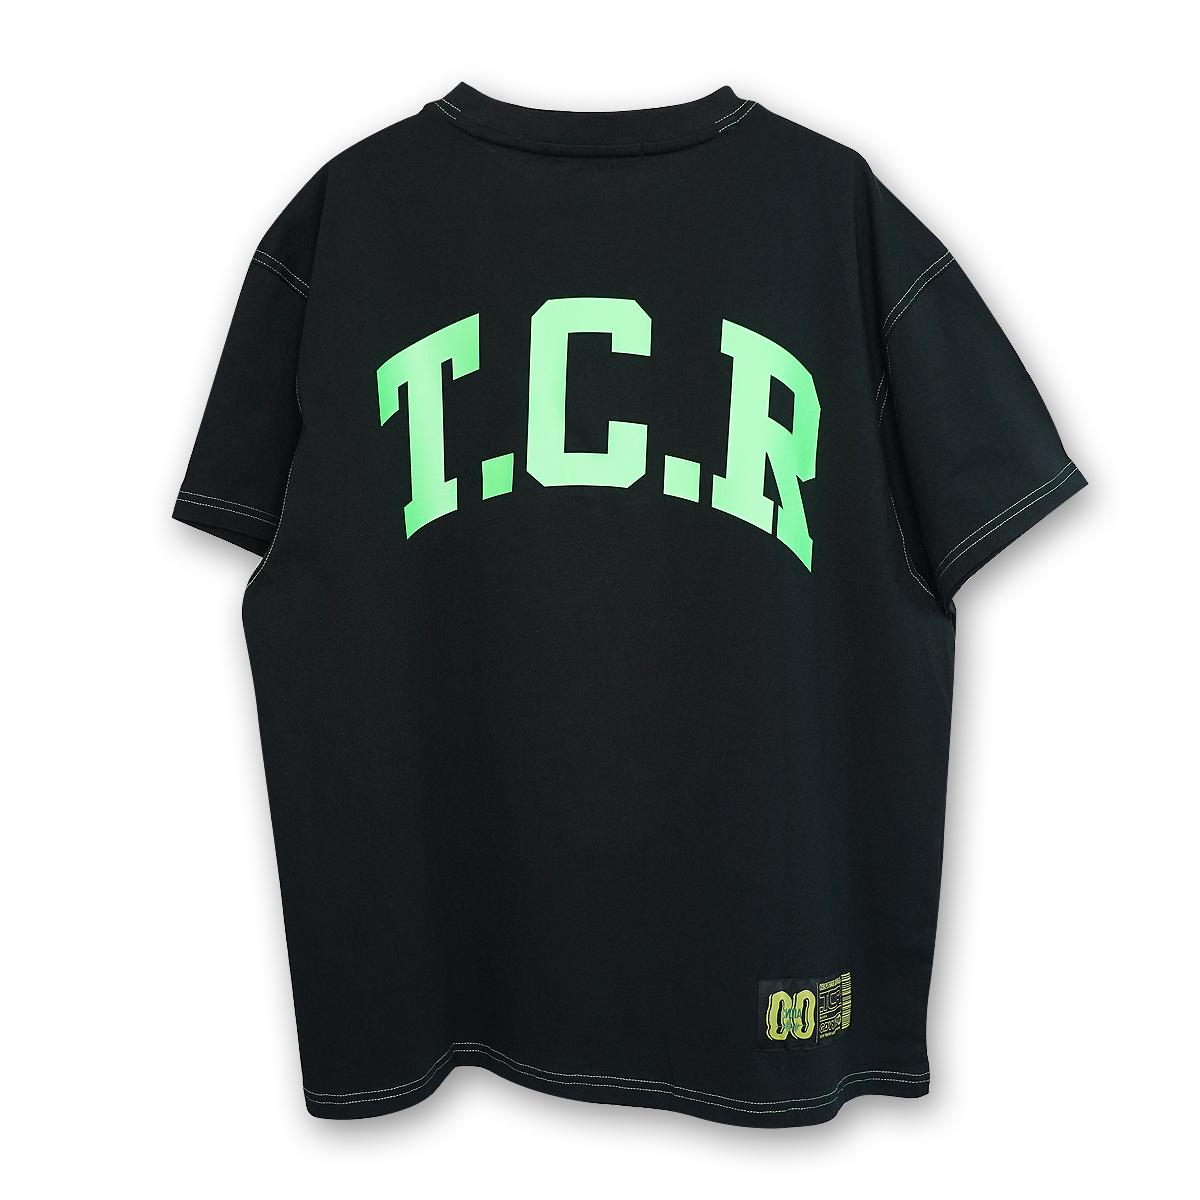 OVERSIZED TCR S/S TEE - BLACK/GREEN